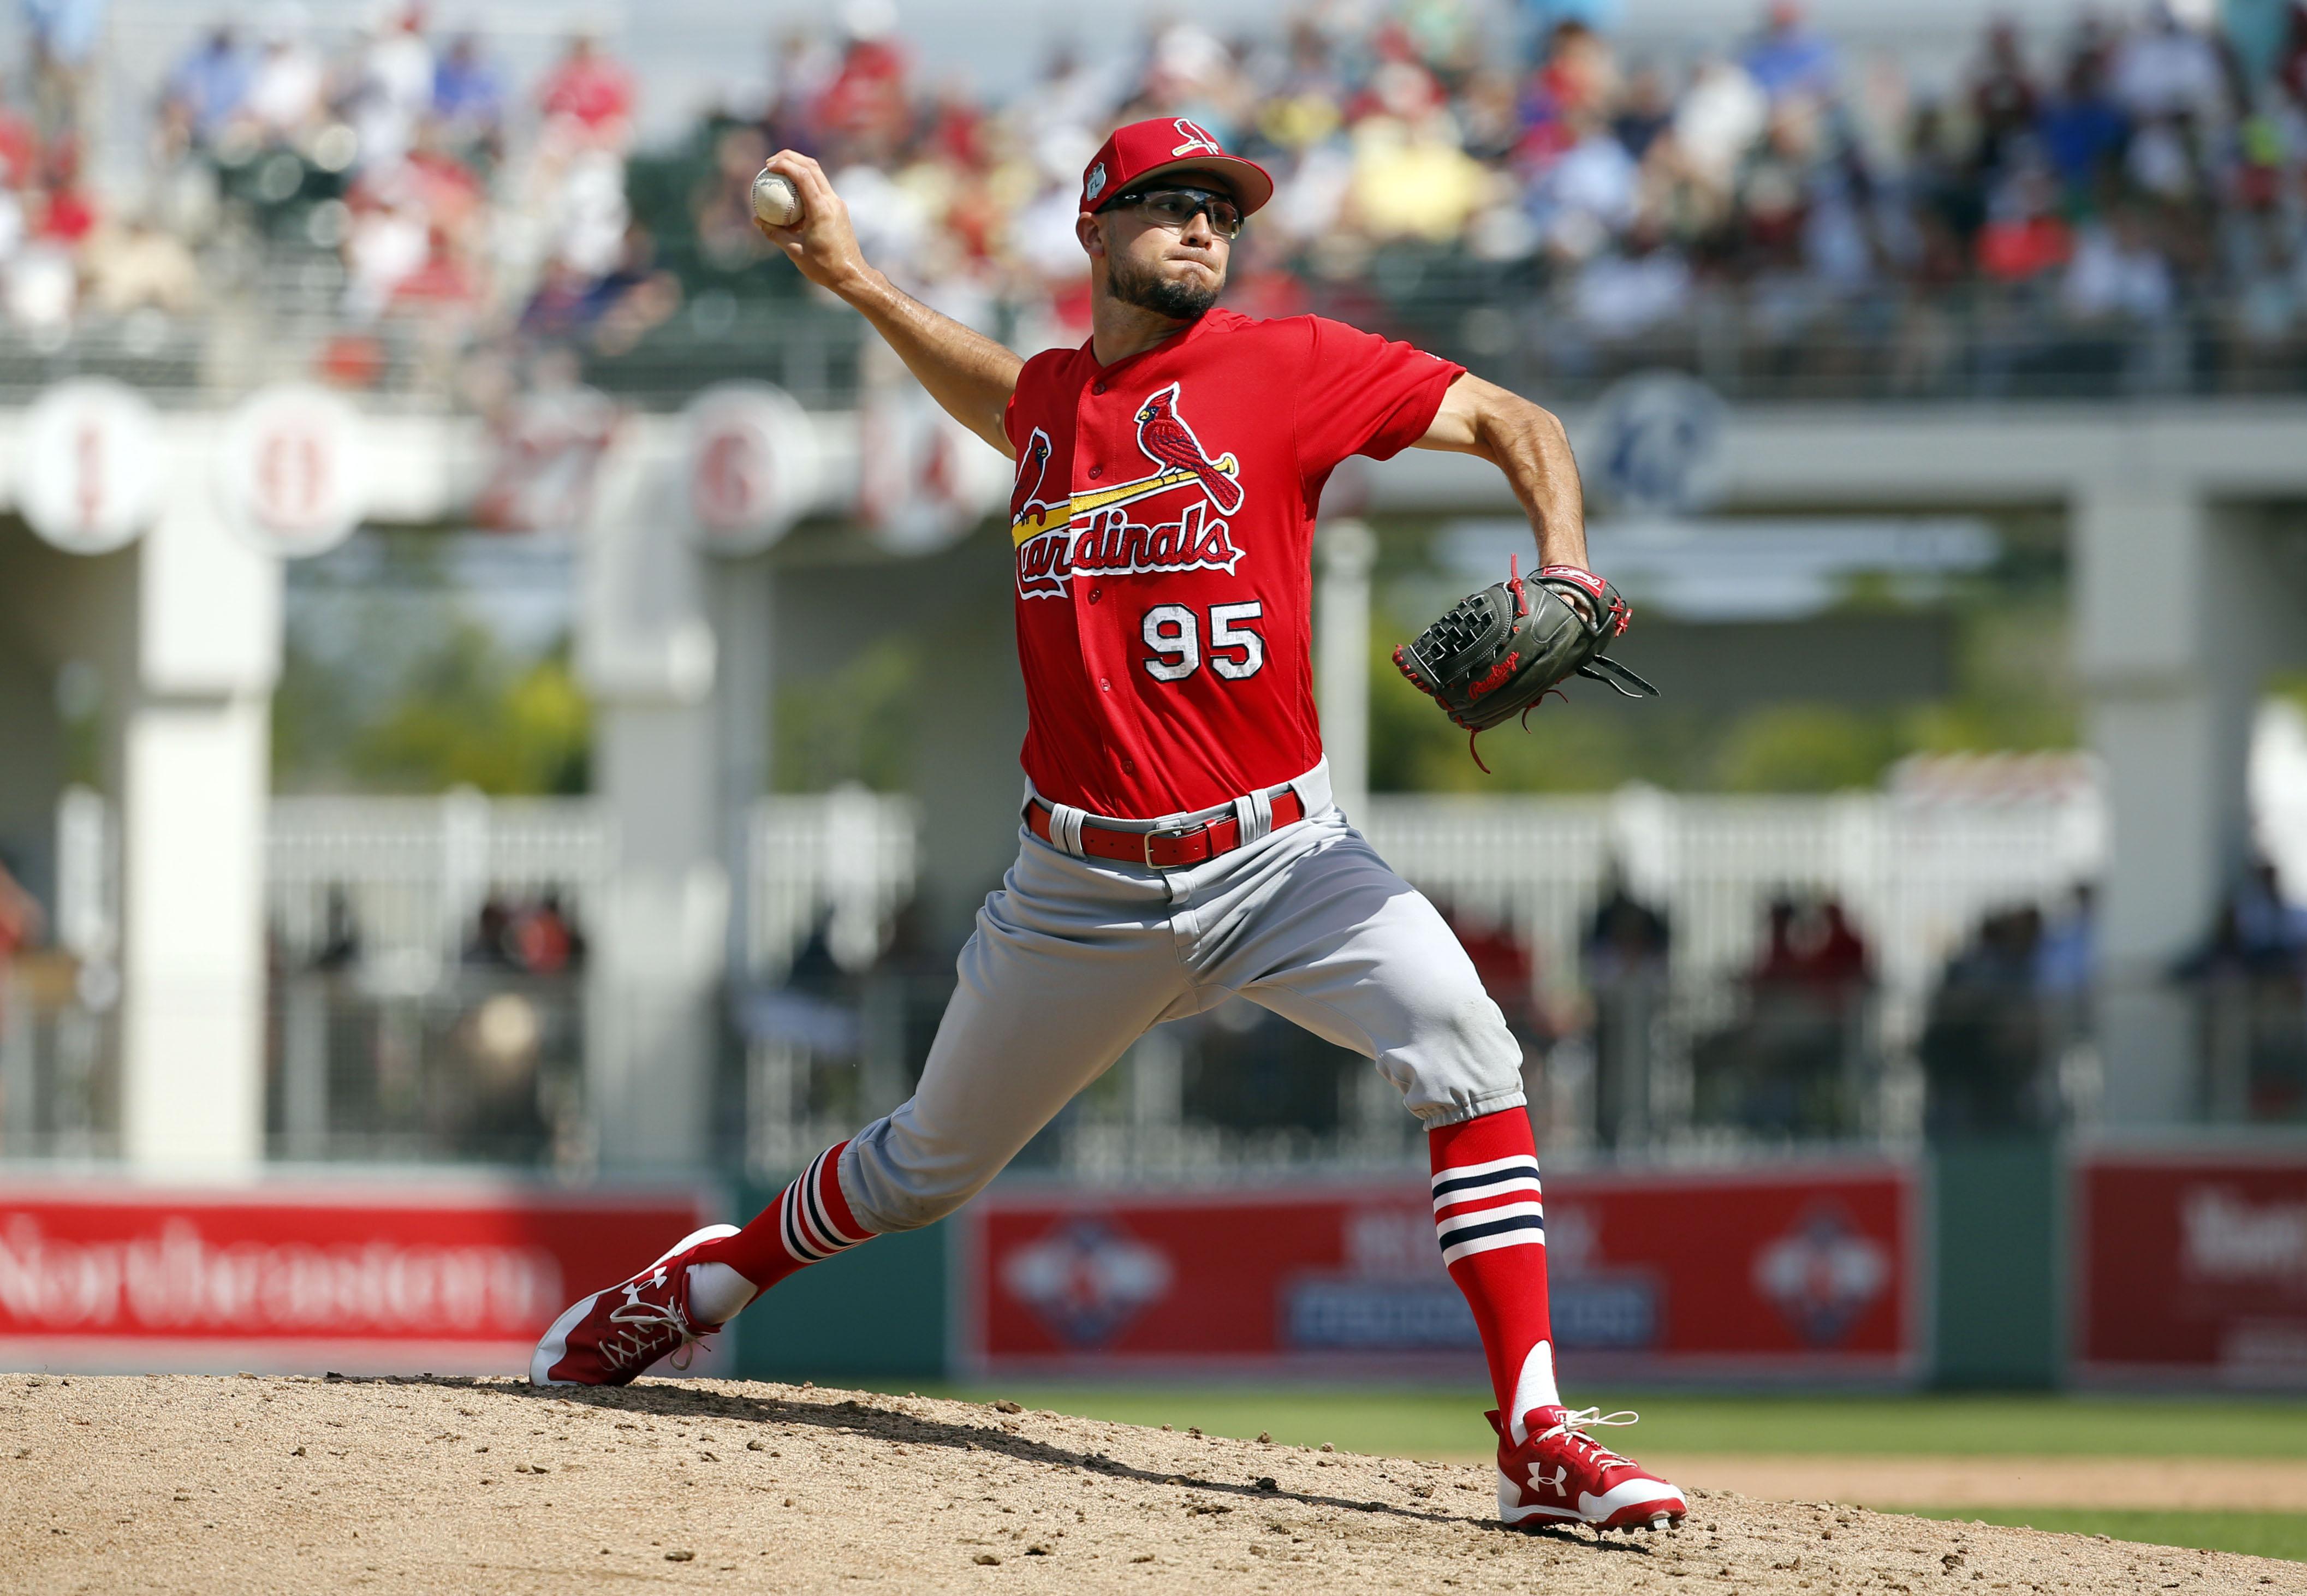 9904755-mlb-spring-training-st.-louis-cardinals-at-boston-red-sox